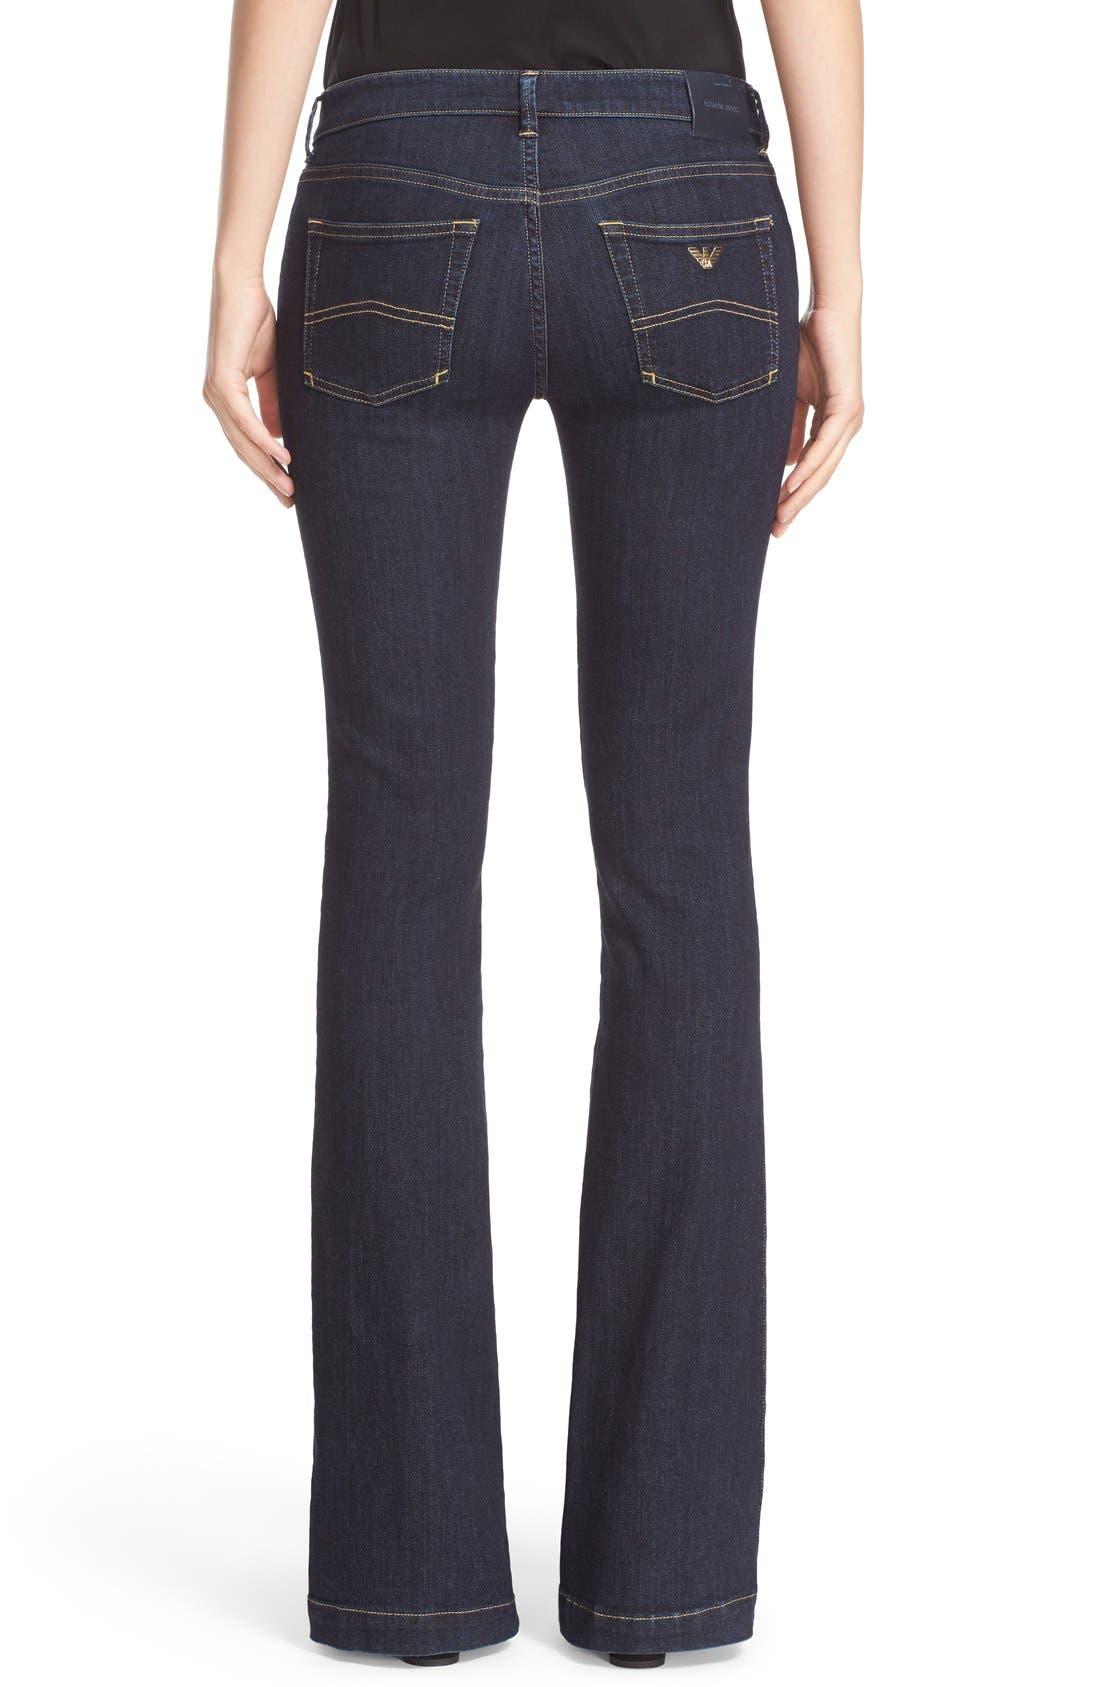 Armani Jeans Bootcut Jeans,                             Alternate thumbnail 6, color,                             400